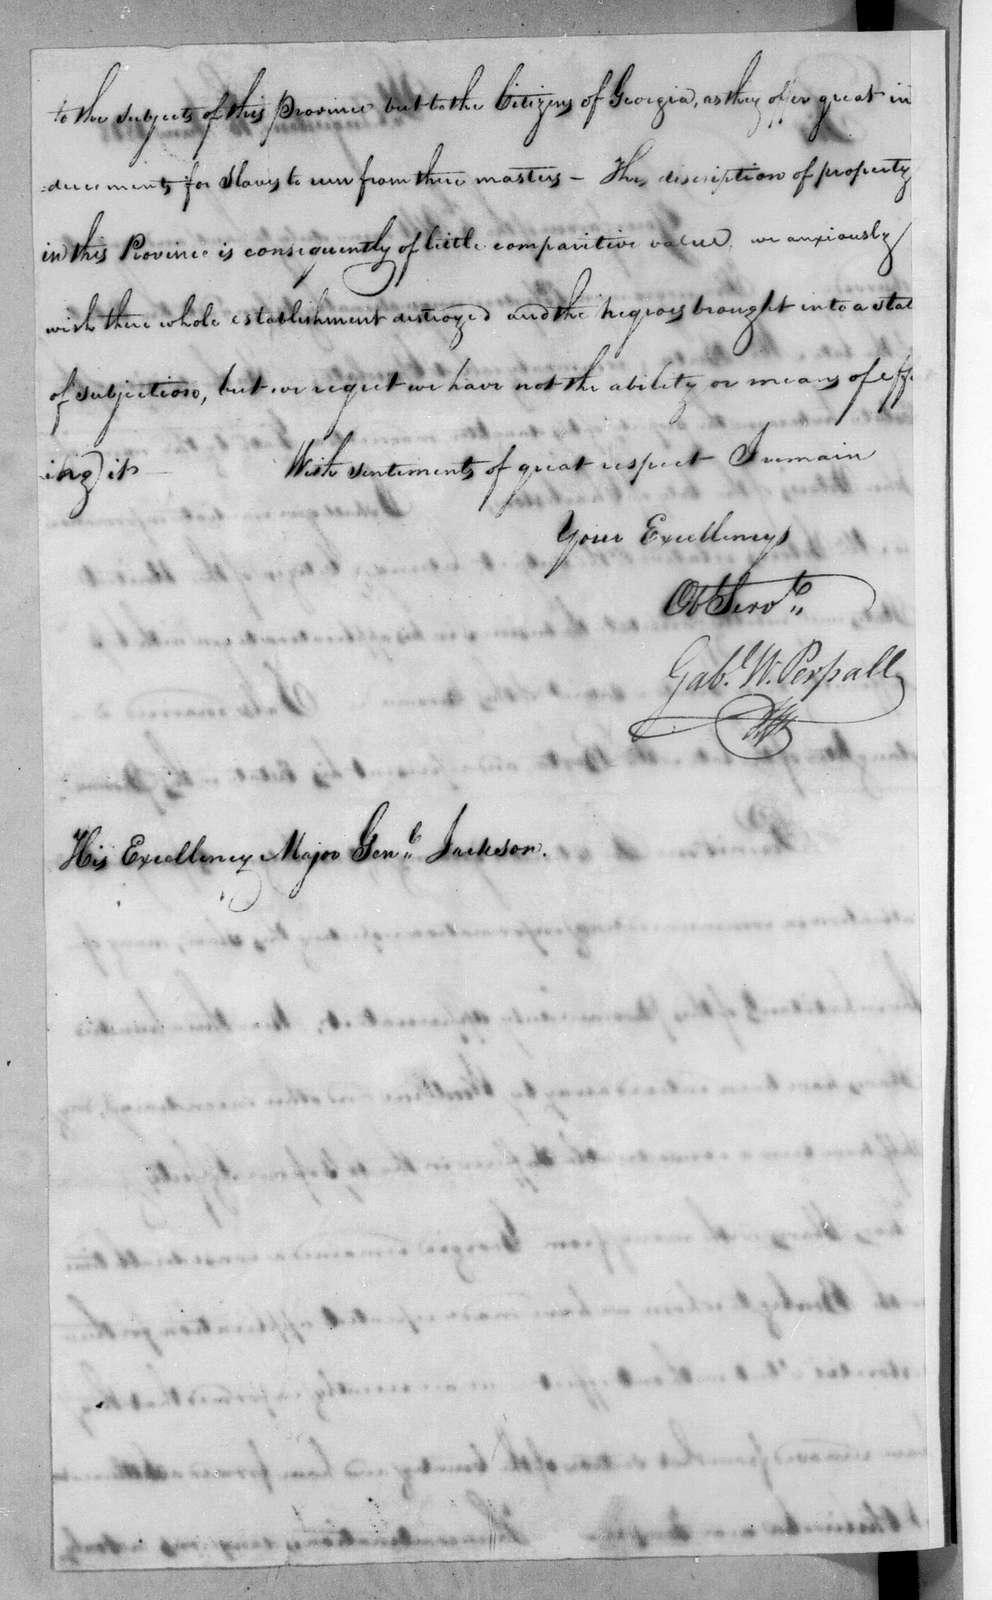 Gabriel William Persall to Andrew Jackson, June 16, 1818